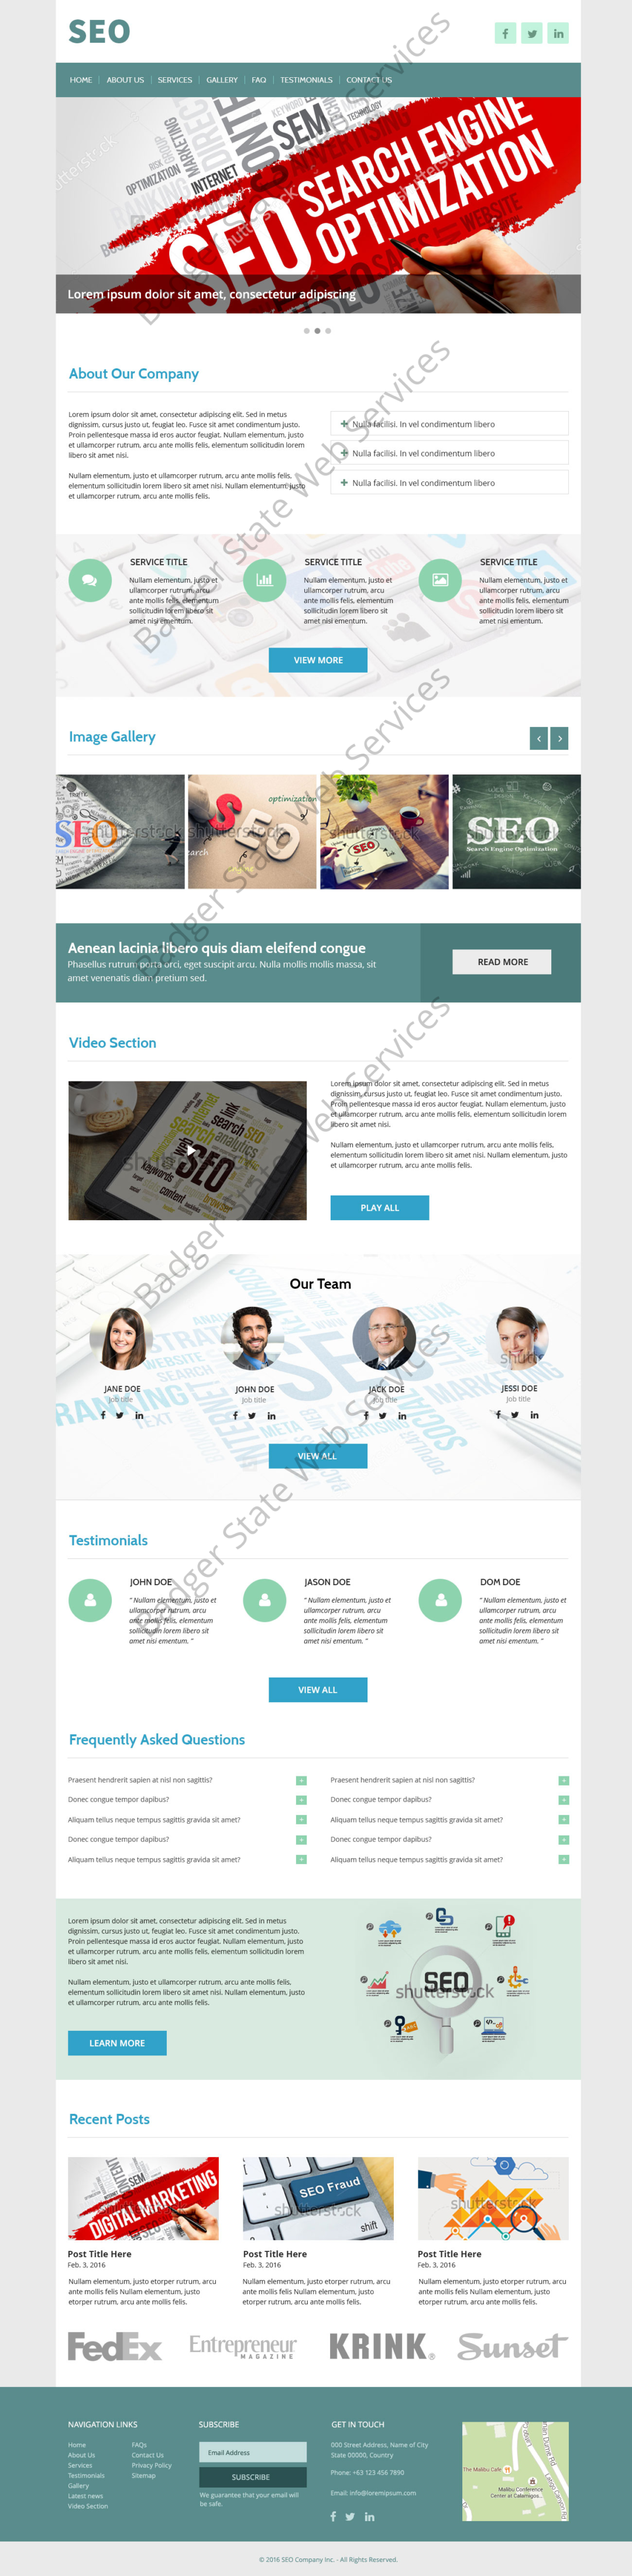 SEO Web Design Mockup-W